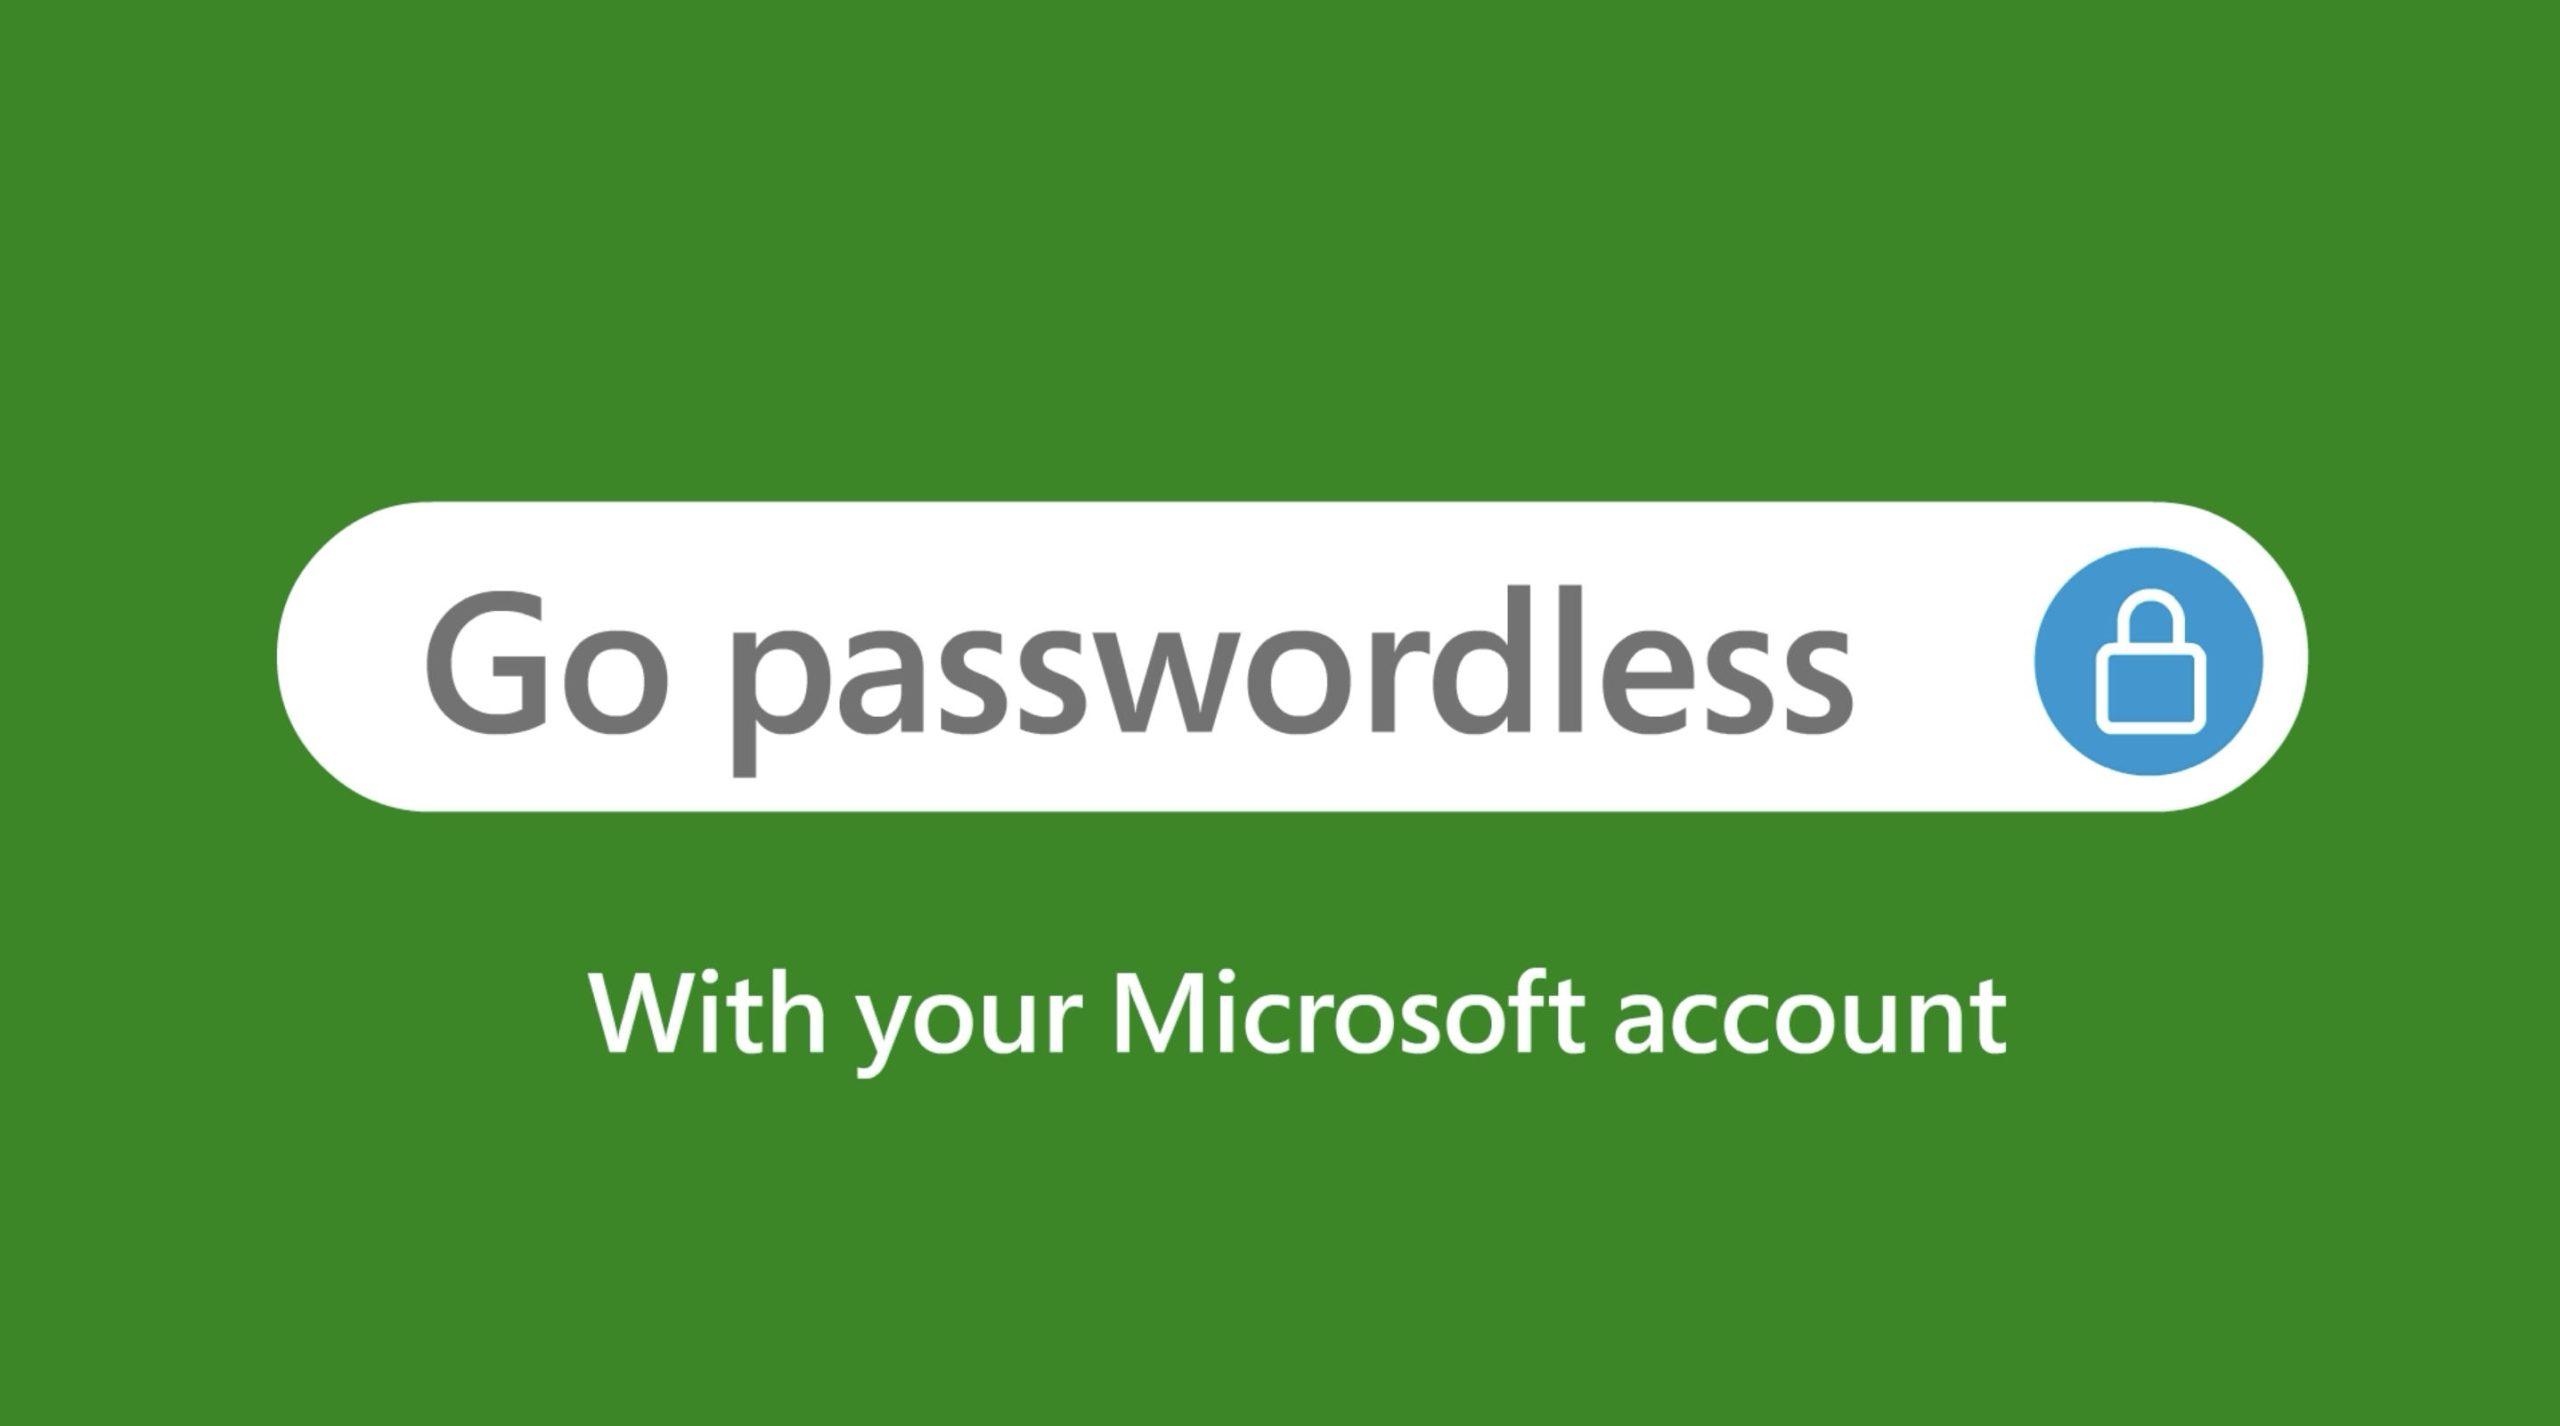 Go Passwordless With Microsoft - Credit Microsoft